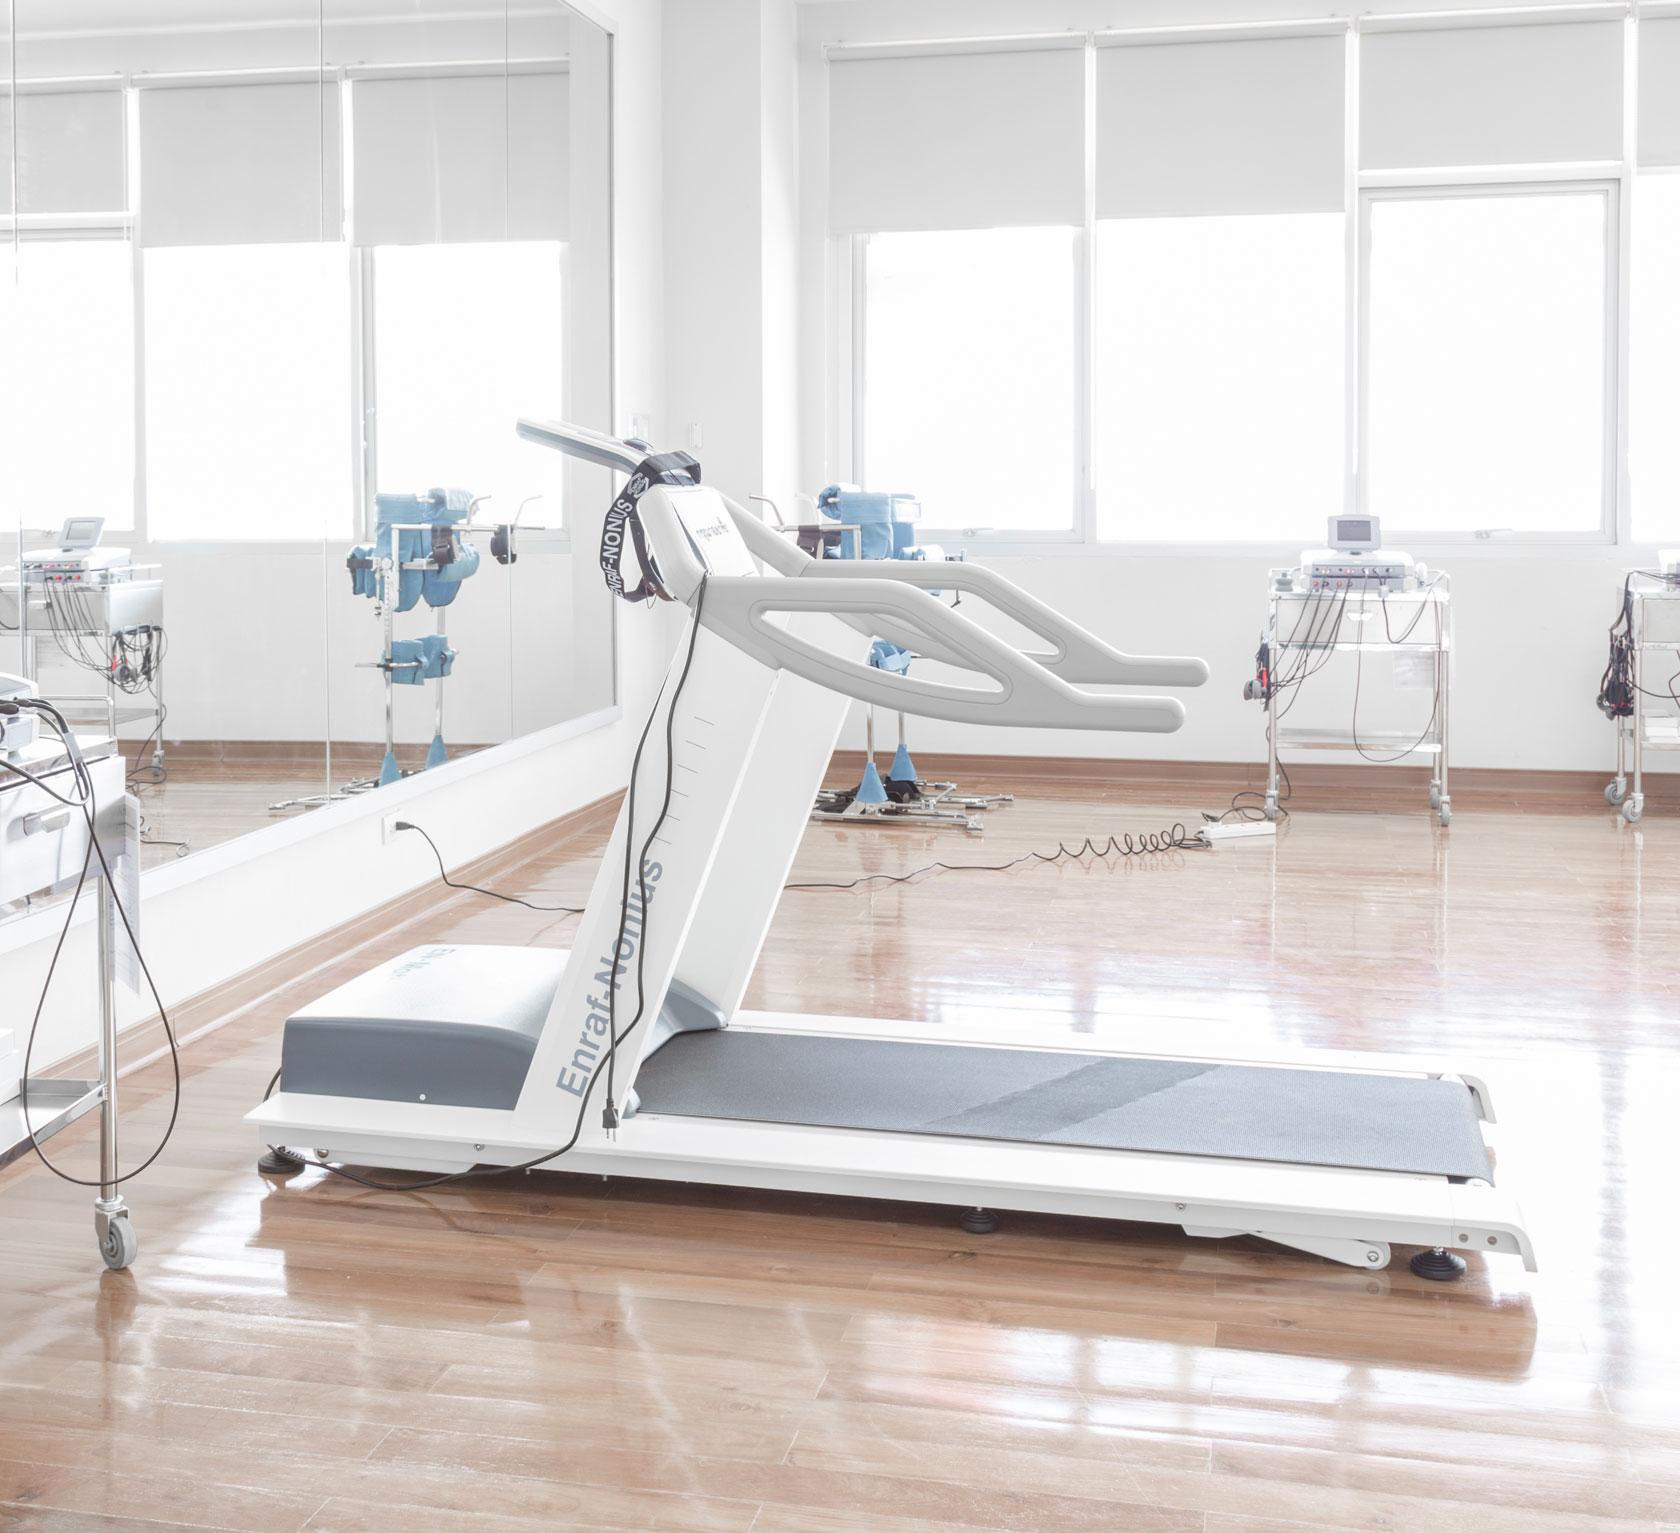 Studio FORM - Fisioterapia, Osteopatia, Riabilitazione a Milano